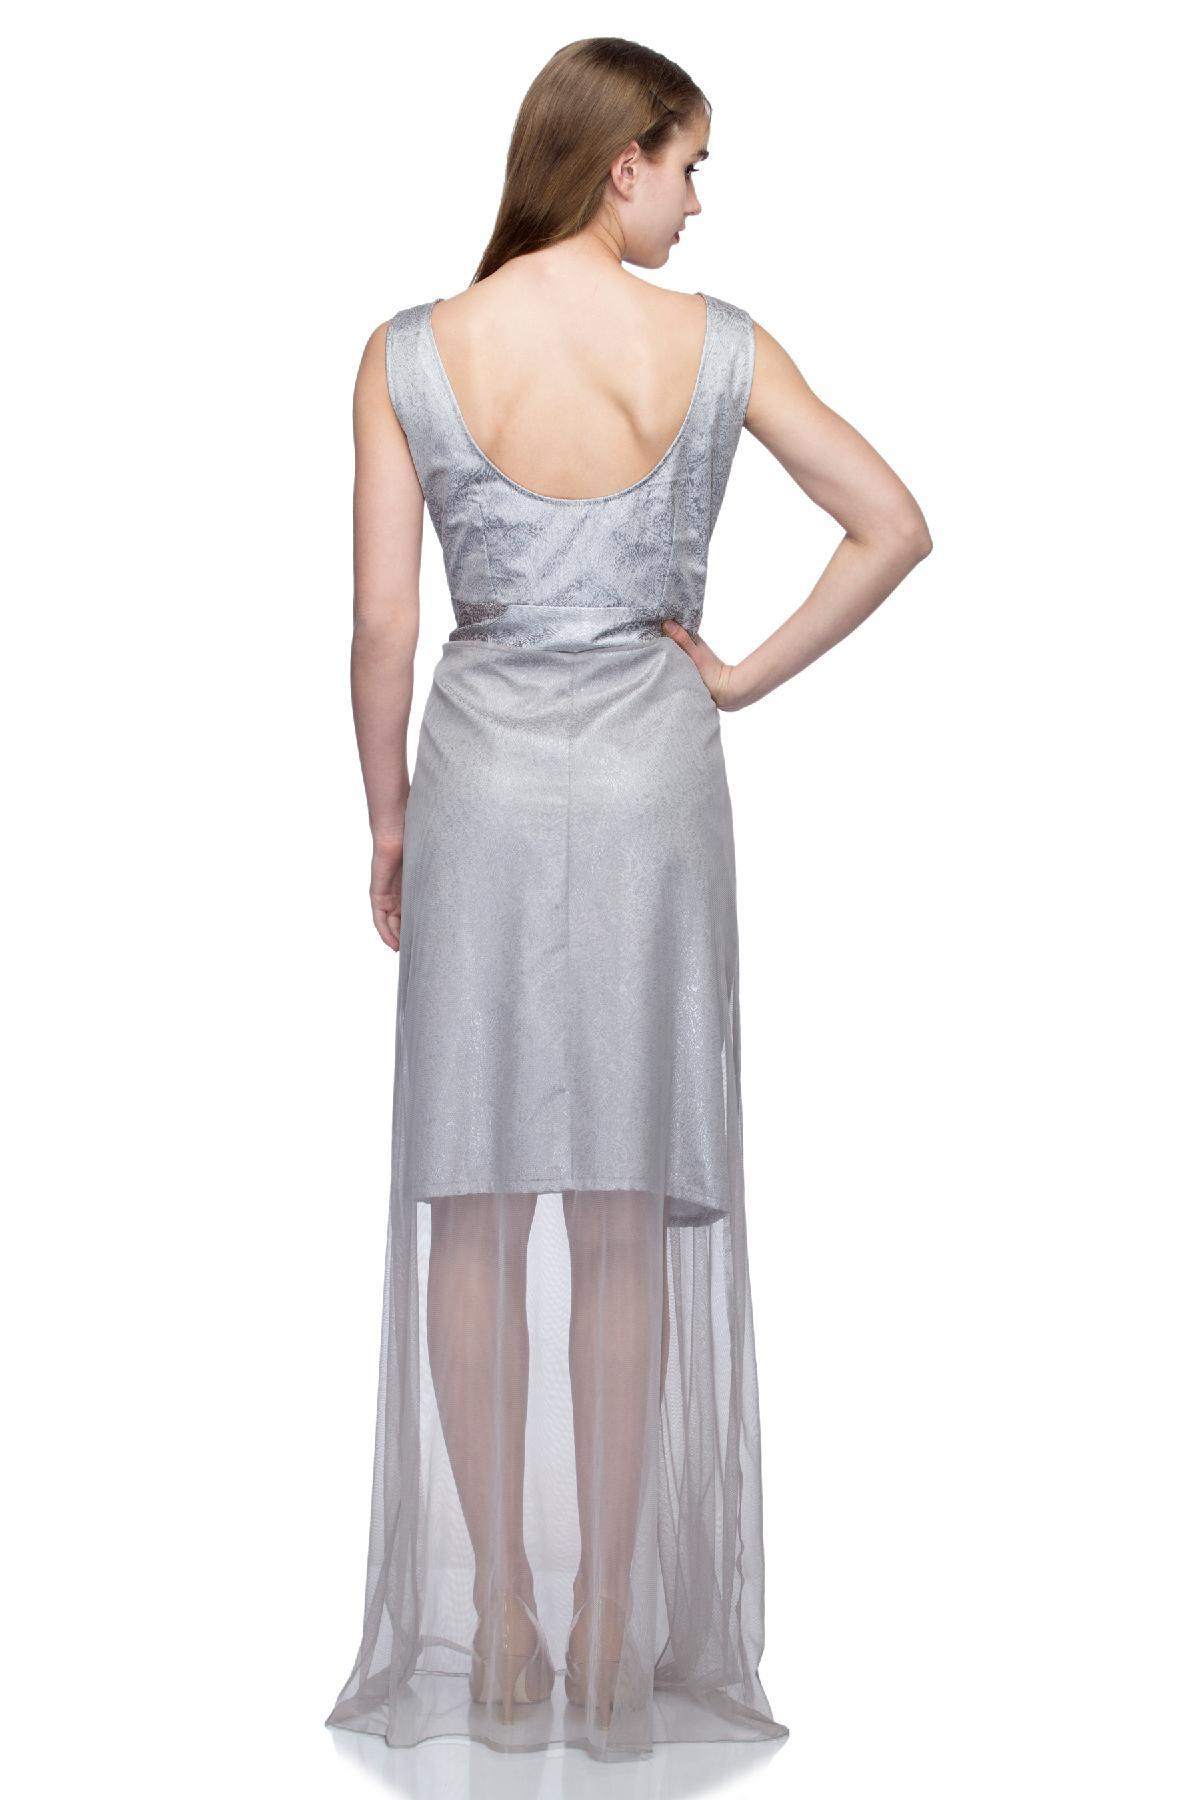 Grey Brocade Sheer Gown by Trendy Diva for rent online   RENT IT BAE